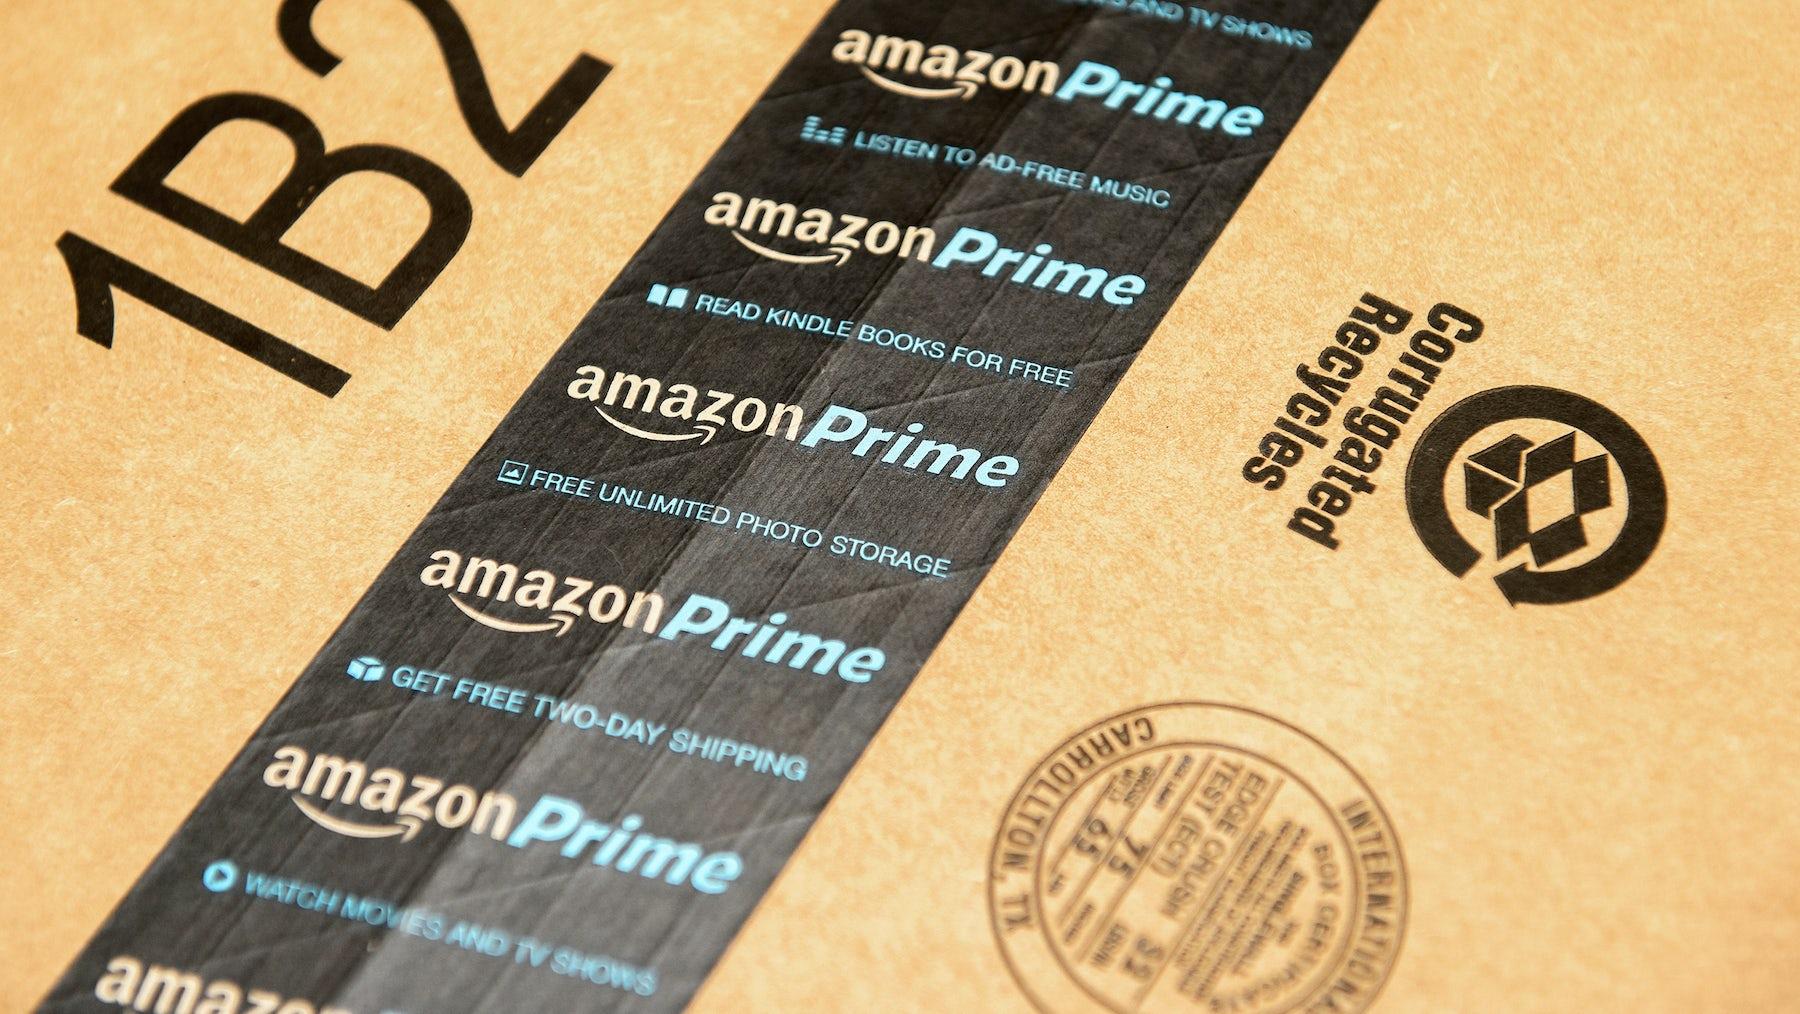 Amazon Package | Source: Shutterstock